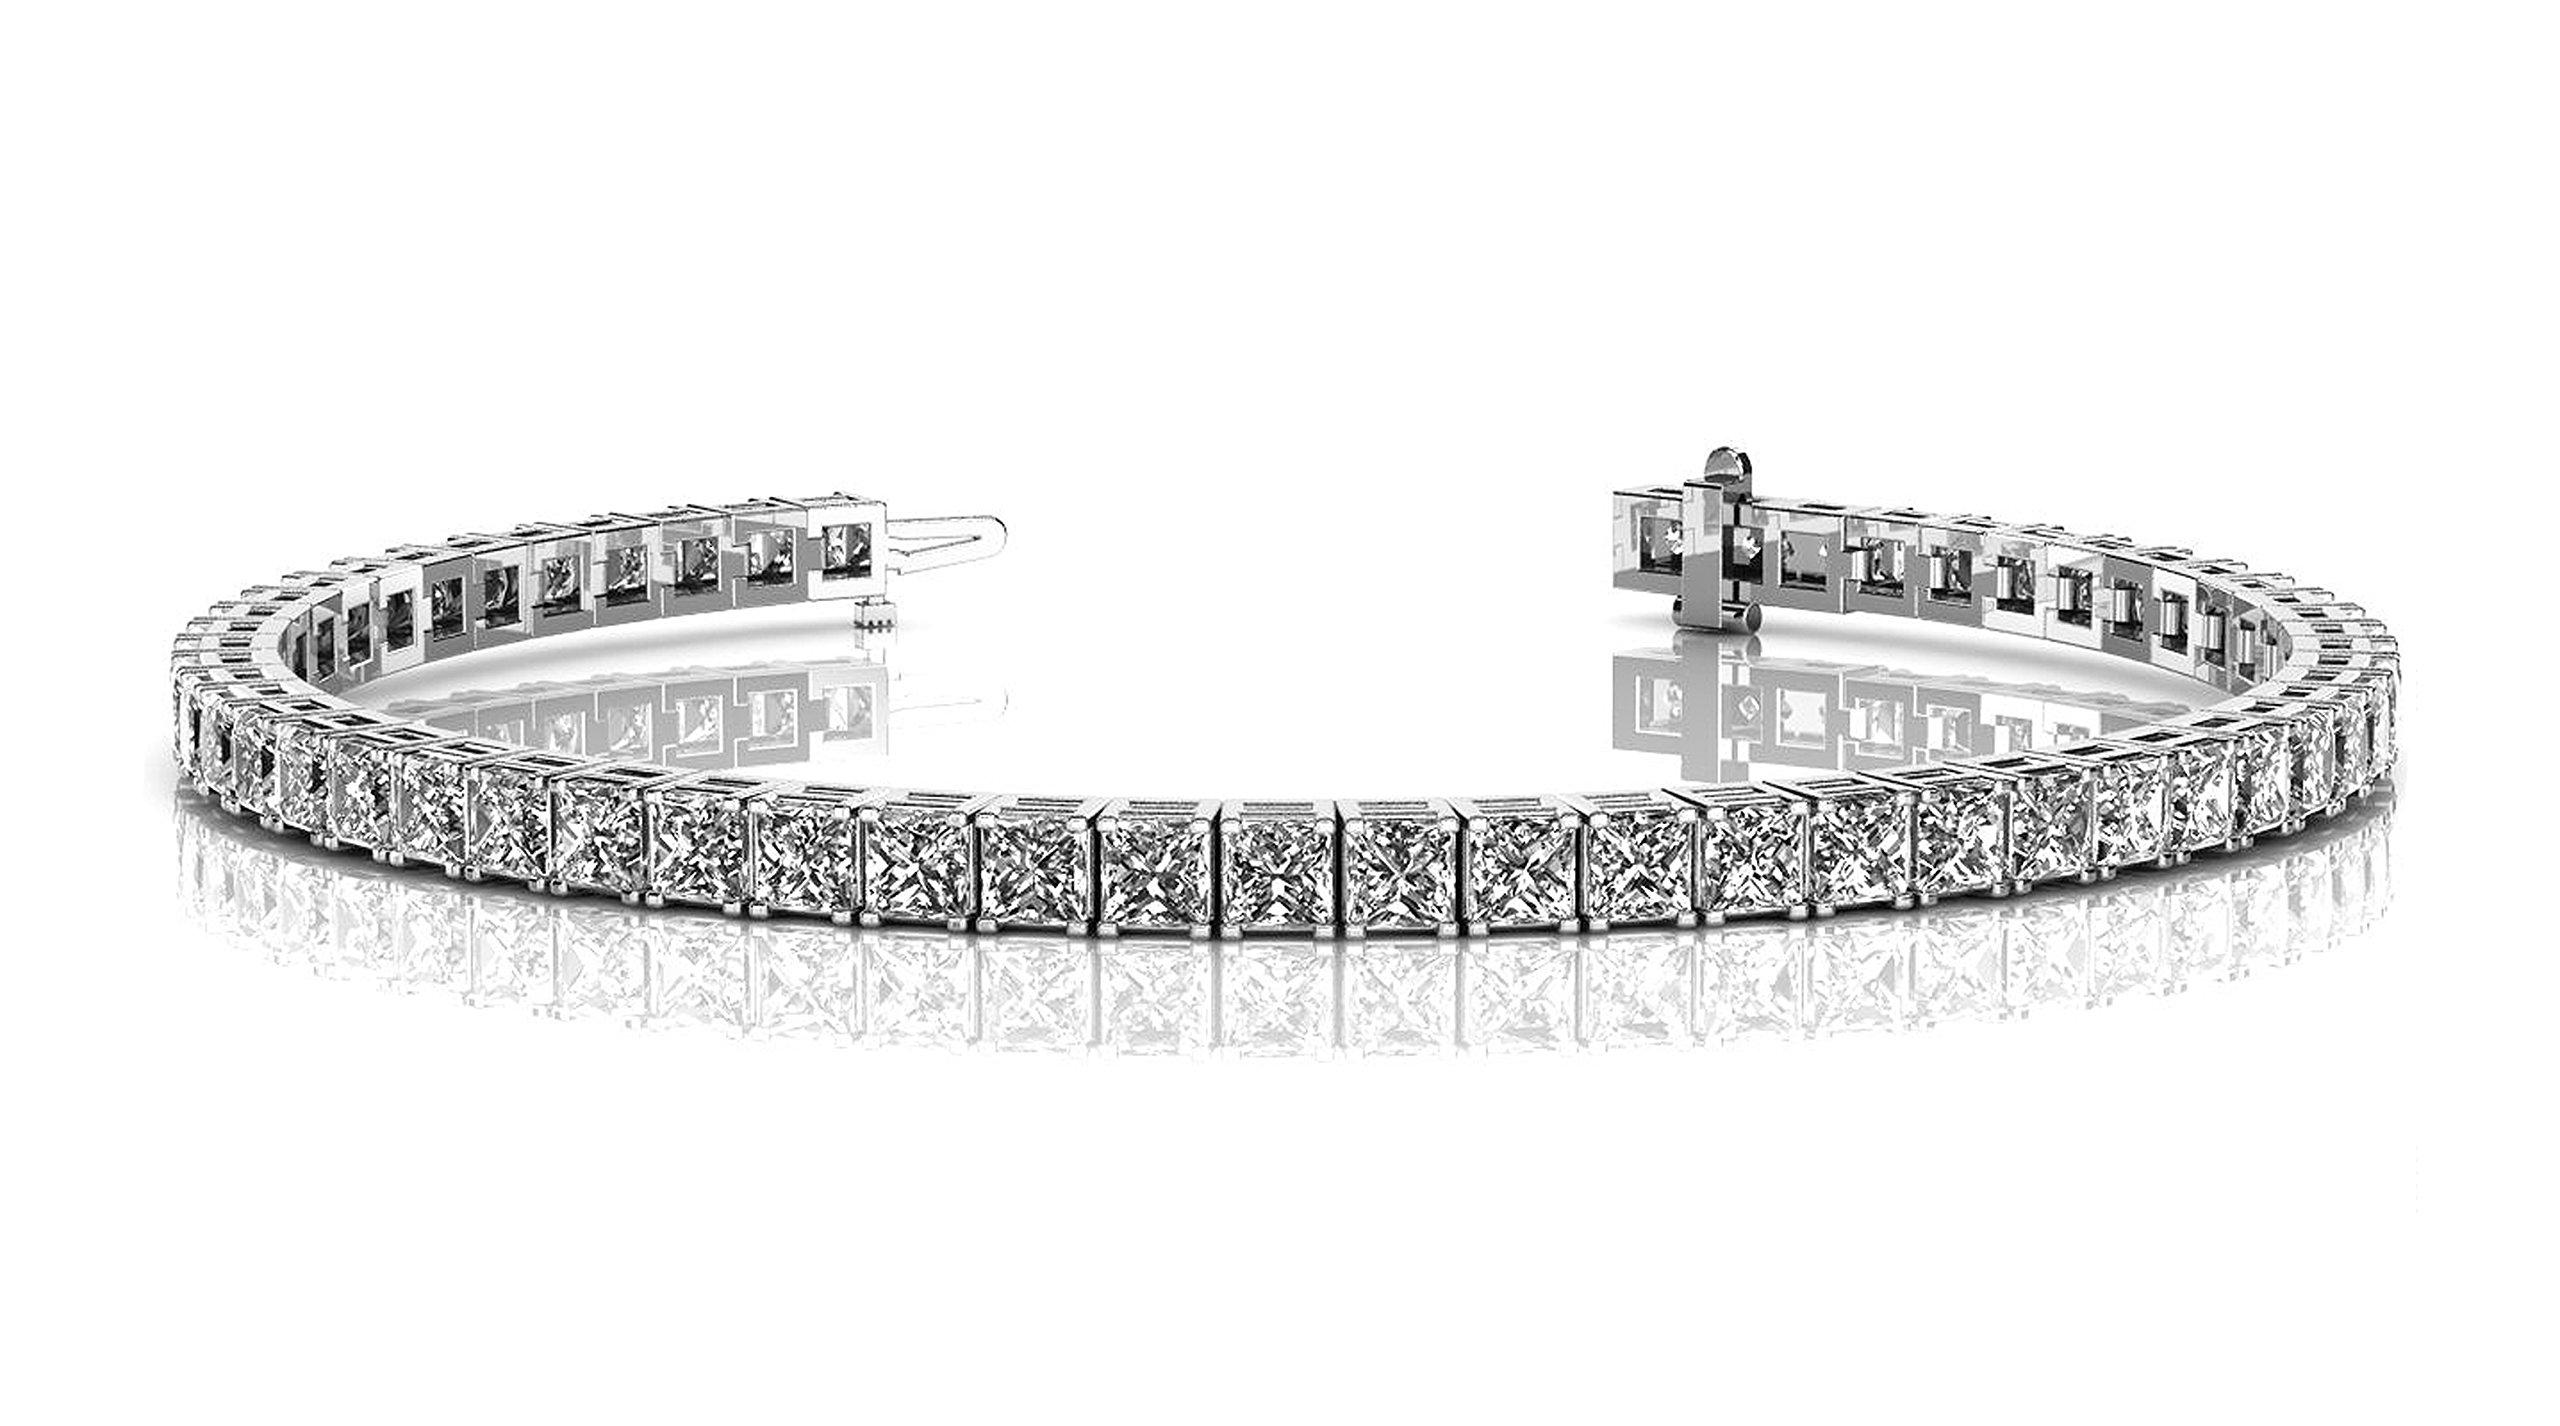 Cate & Chloe Leila 18k Tennis Bracelet, Women's 18k White Gold Plated Tennis Bracelet w/Cubic Zirconia Square Crystals, 7.5'' Sparkling Stone Bracelet for Women, Silver CZ Wrist Bracelets, MSRP - $170